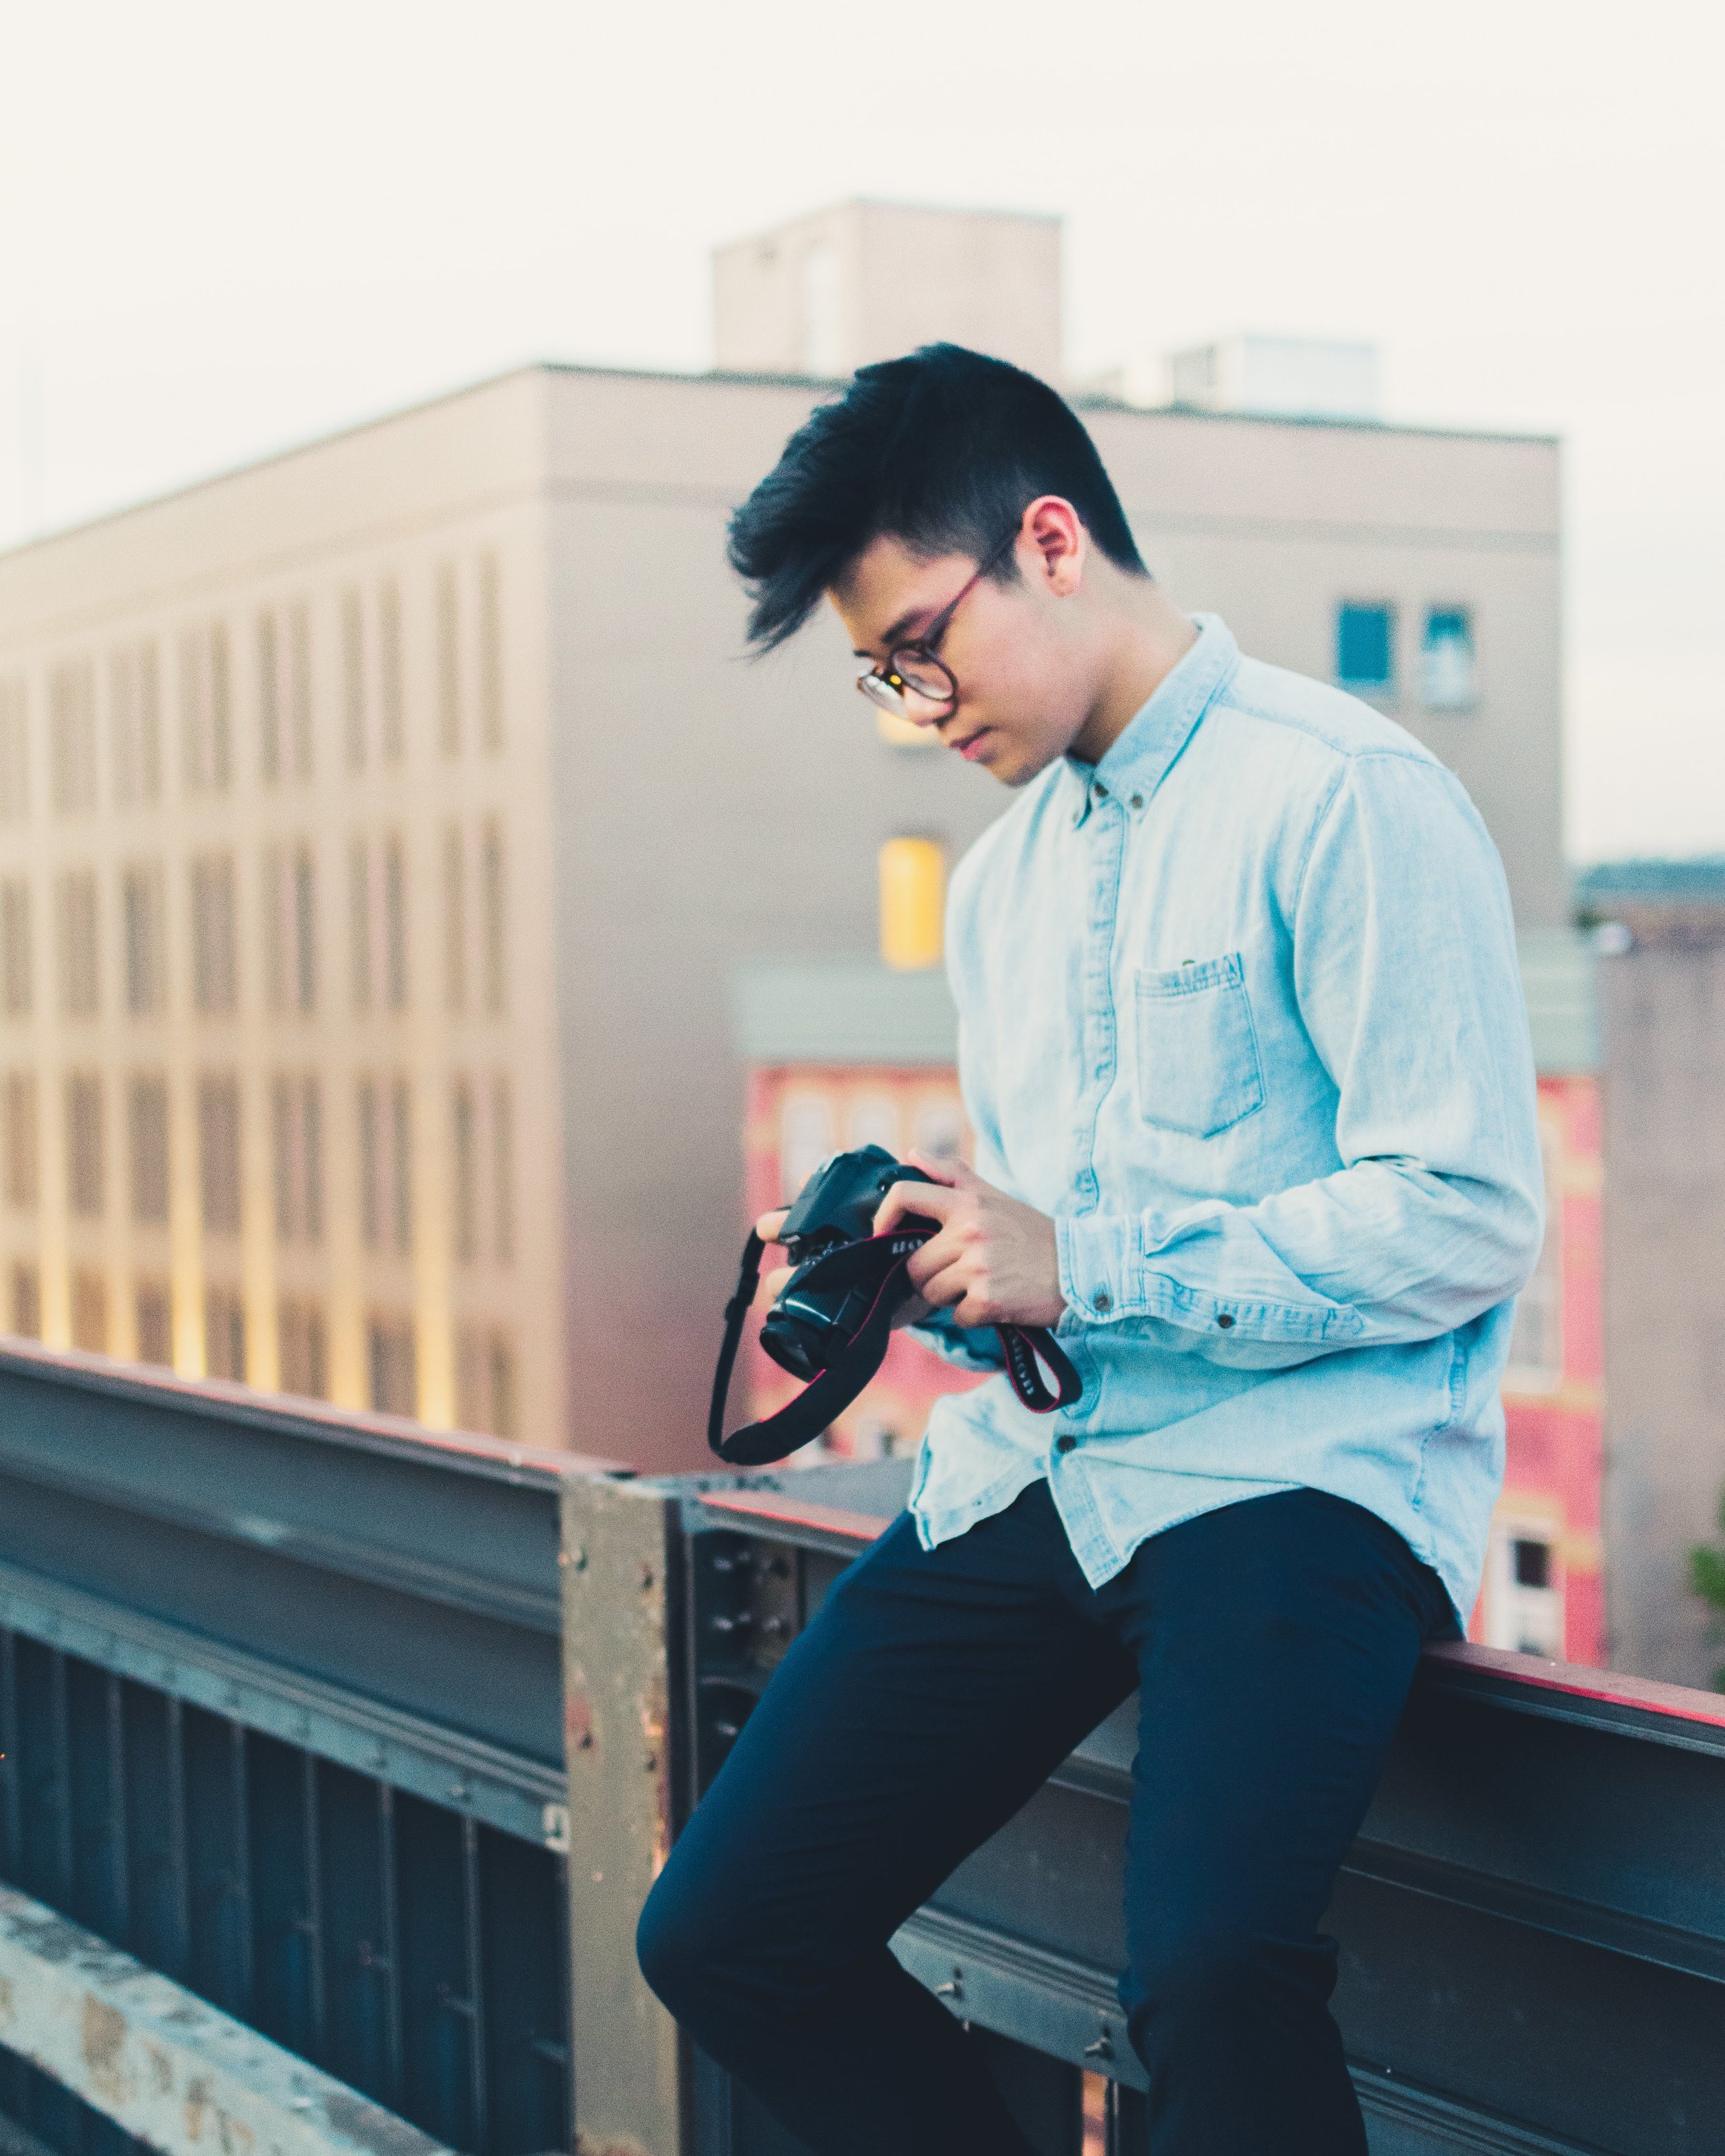 "<p><strong>Tin Vu</strong>Brand Photographer & Videographer<a href=""/area-of-your-site""></a></p>"